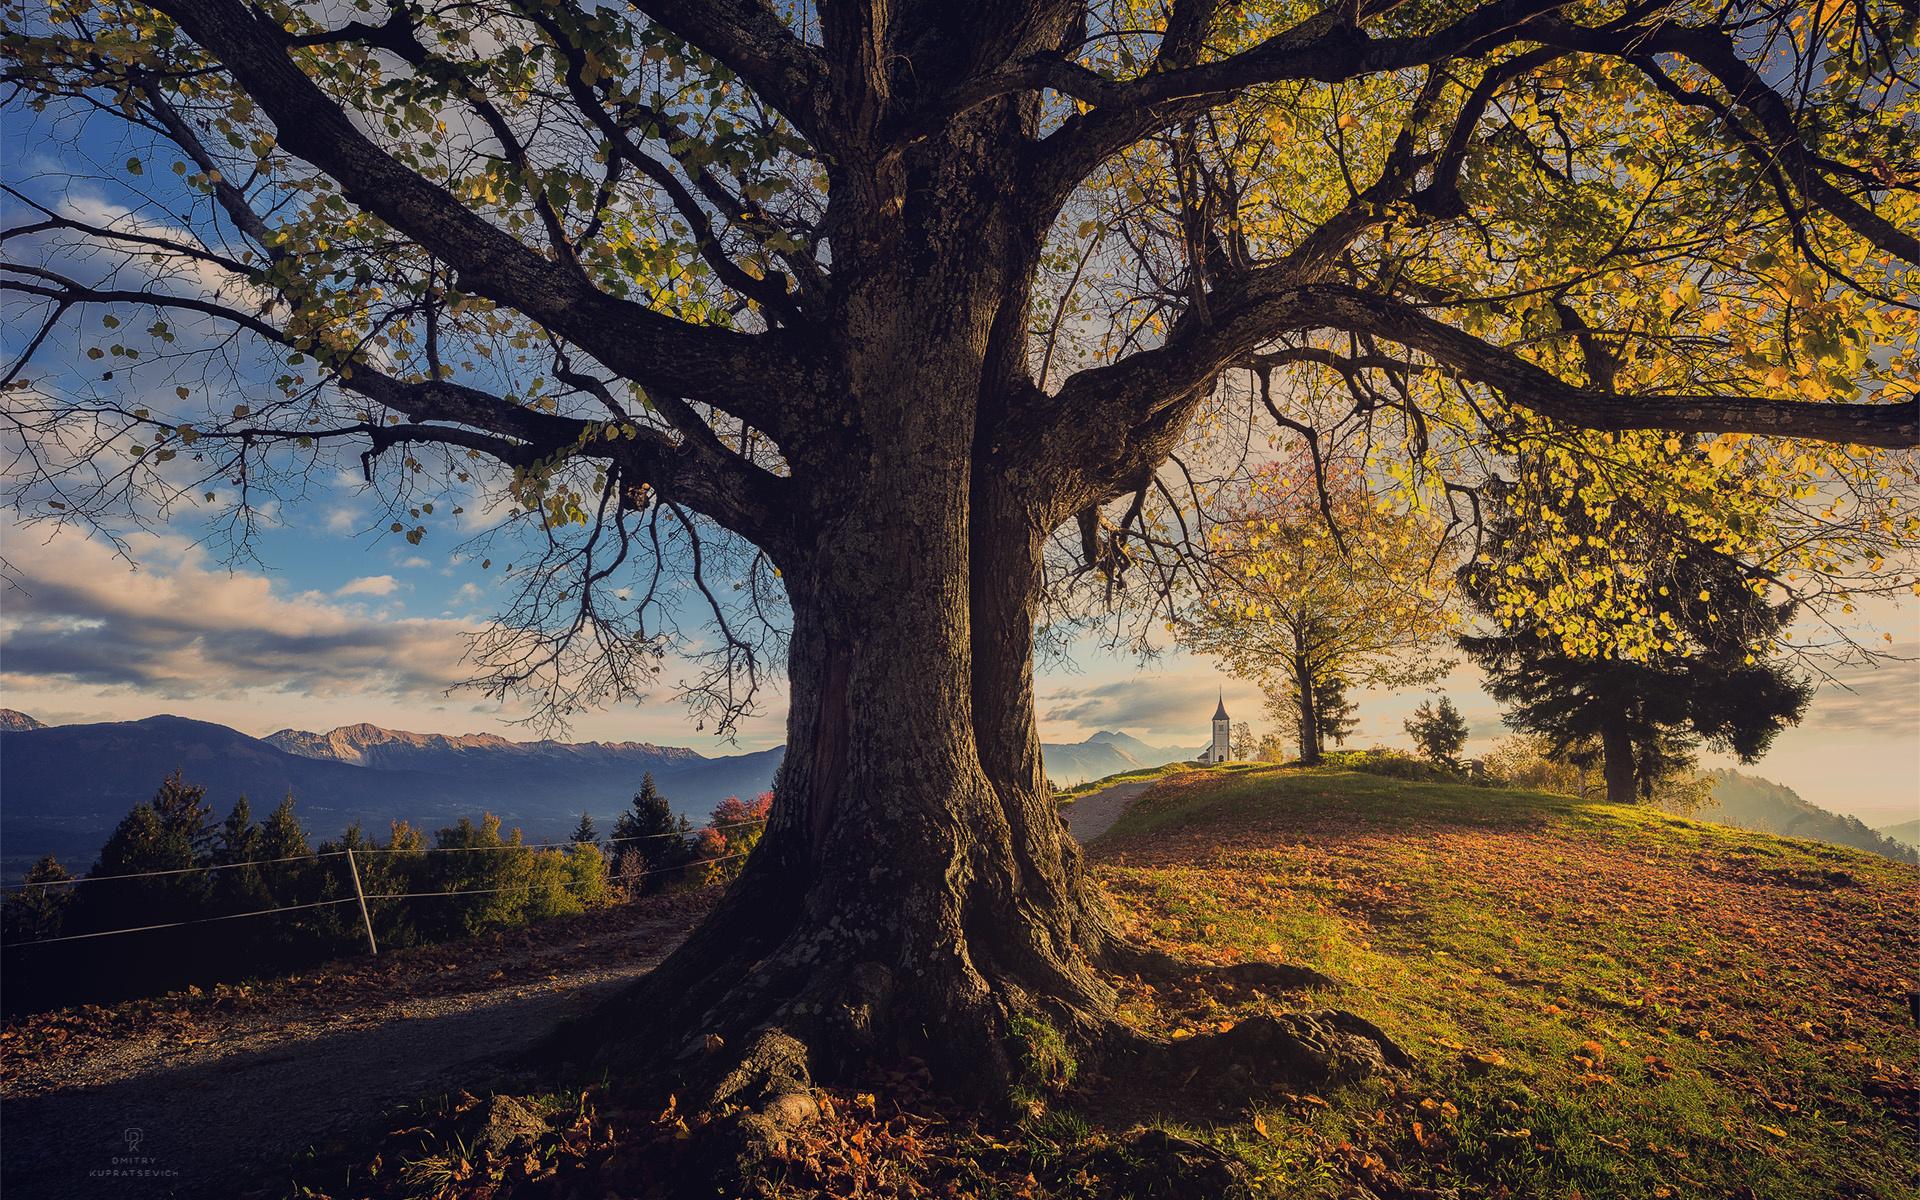 картинки дерево на холме удивились